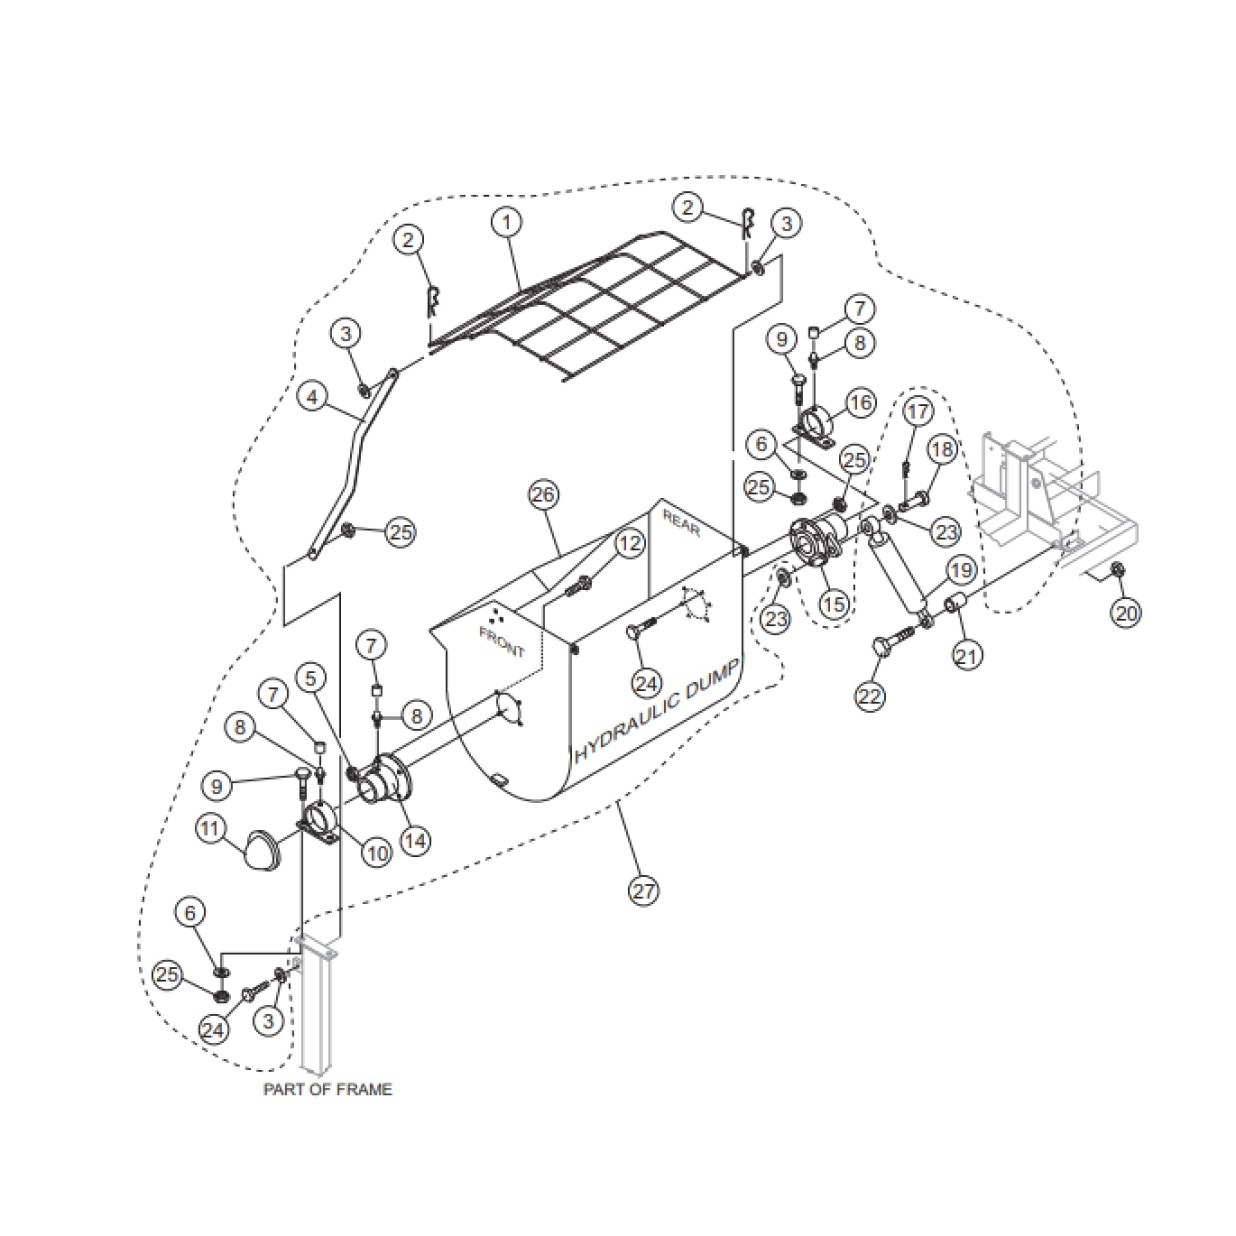 Multiquip Whiteman WM120SH Hydraulic Plaster/mortar Mixer